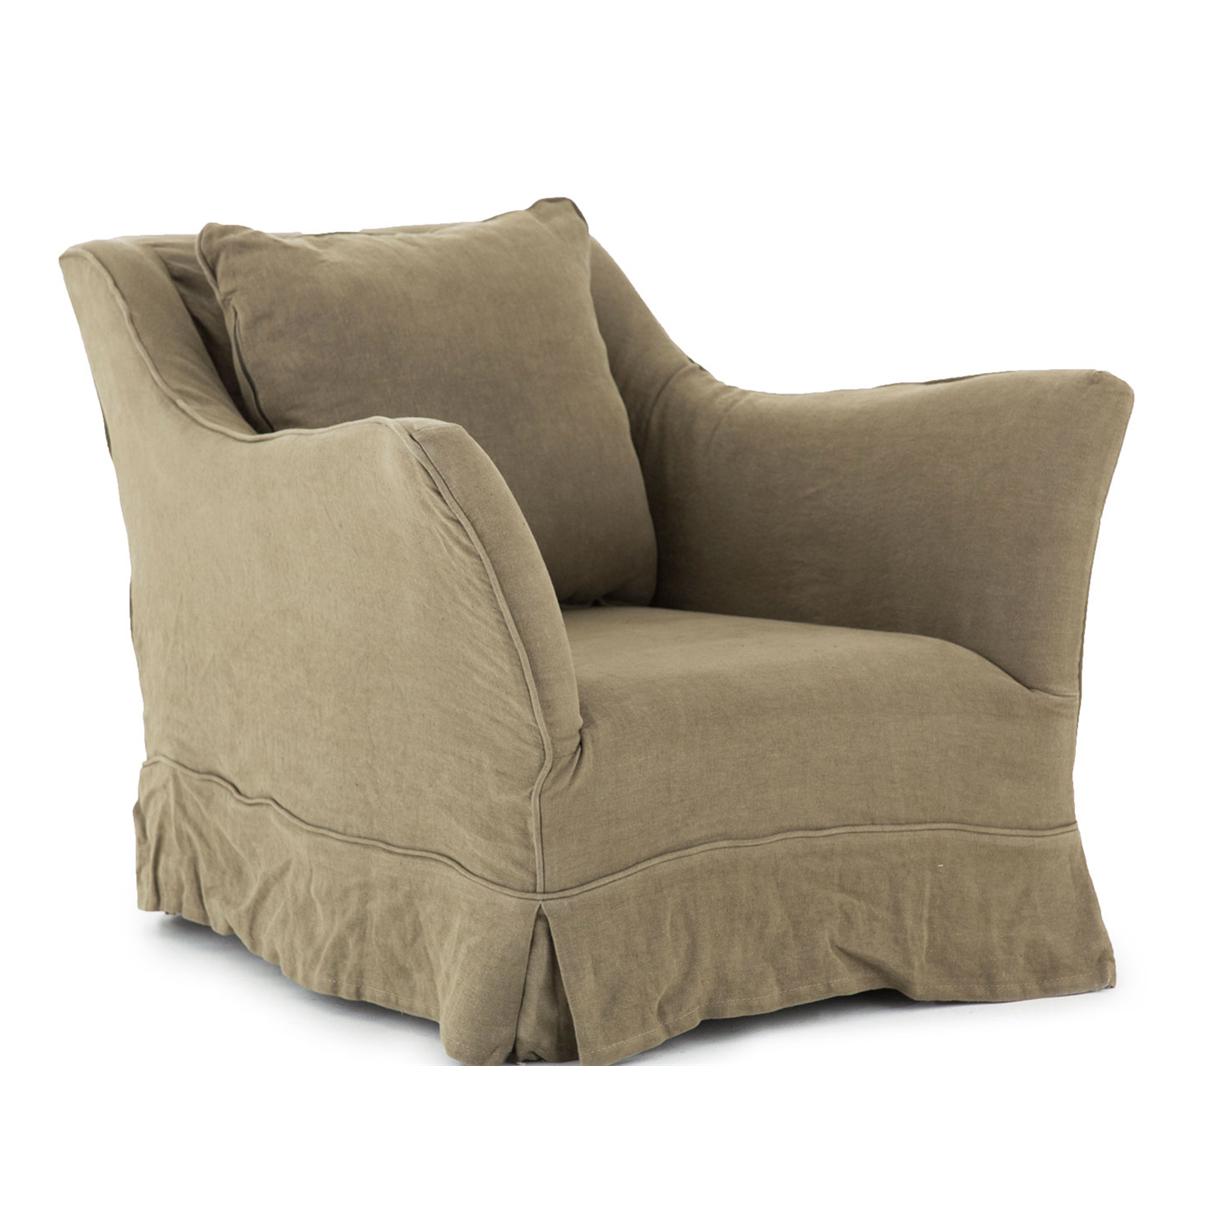 Charme de Provence - Flamant Sofa, Flamant Sessel